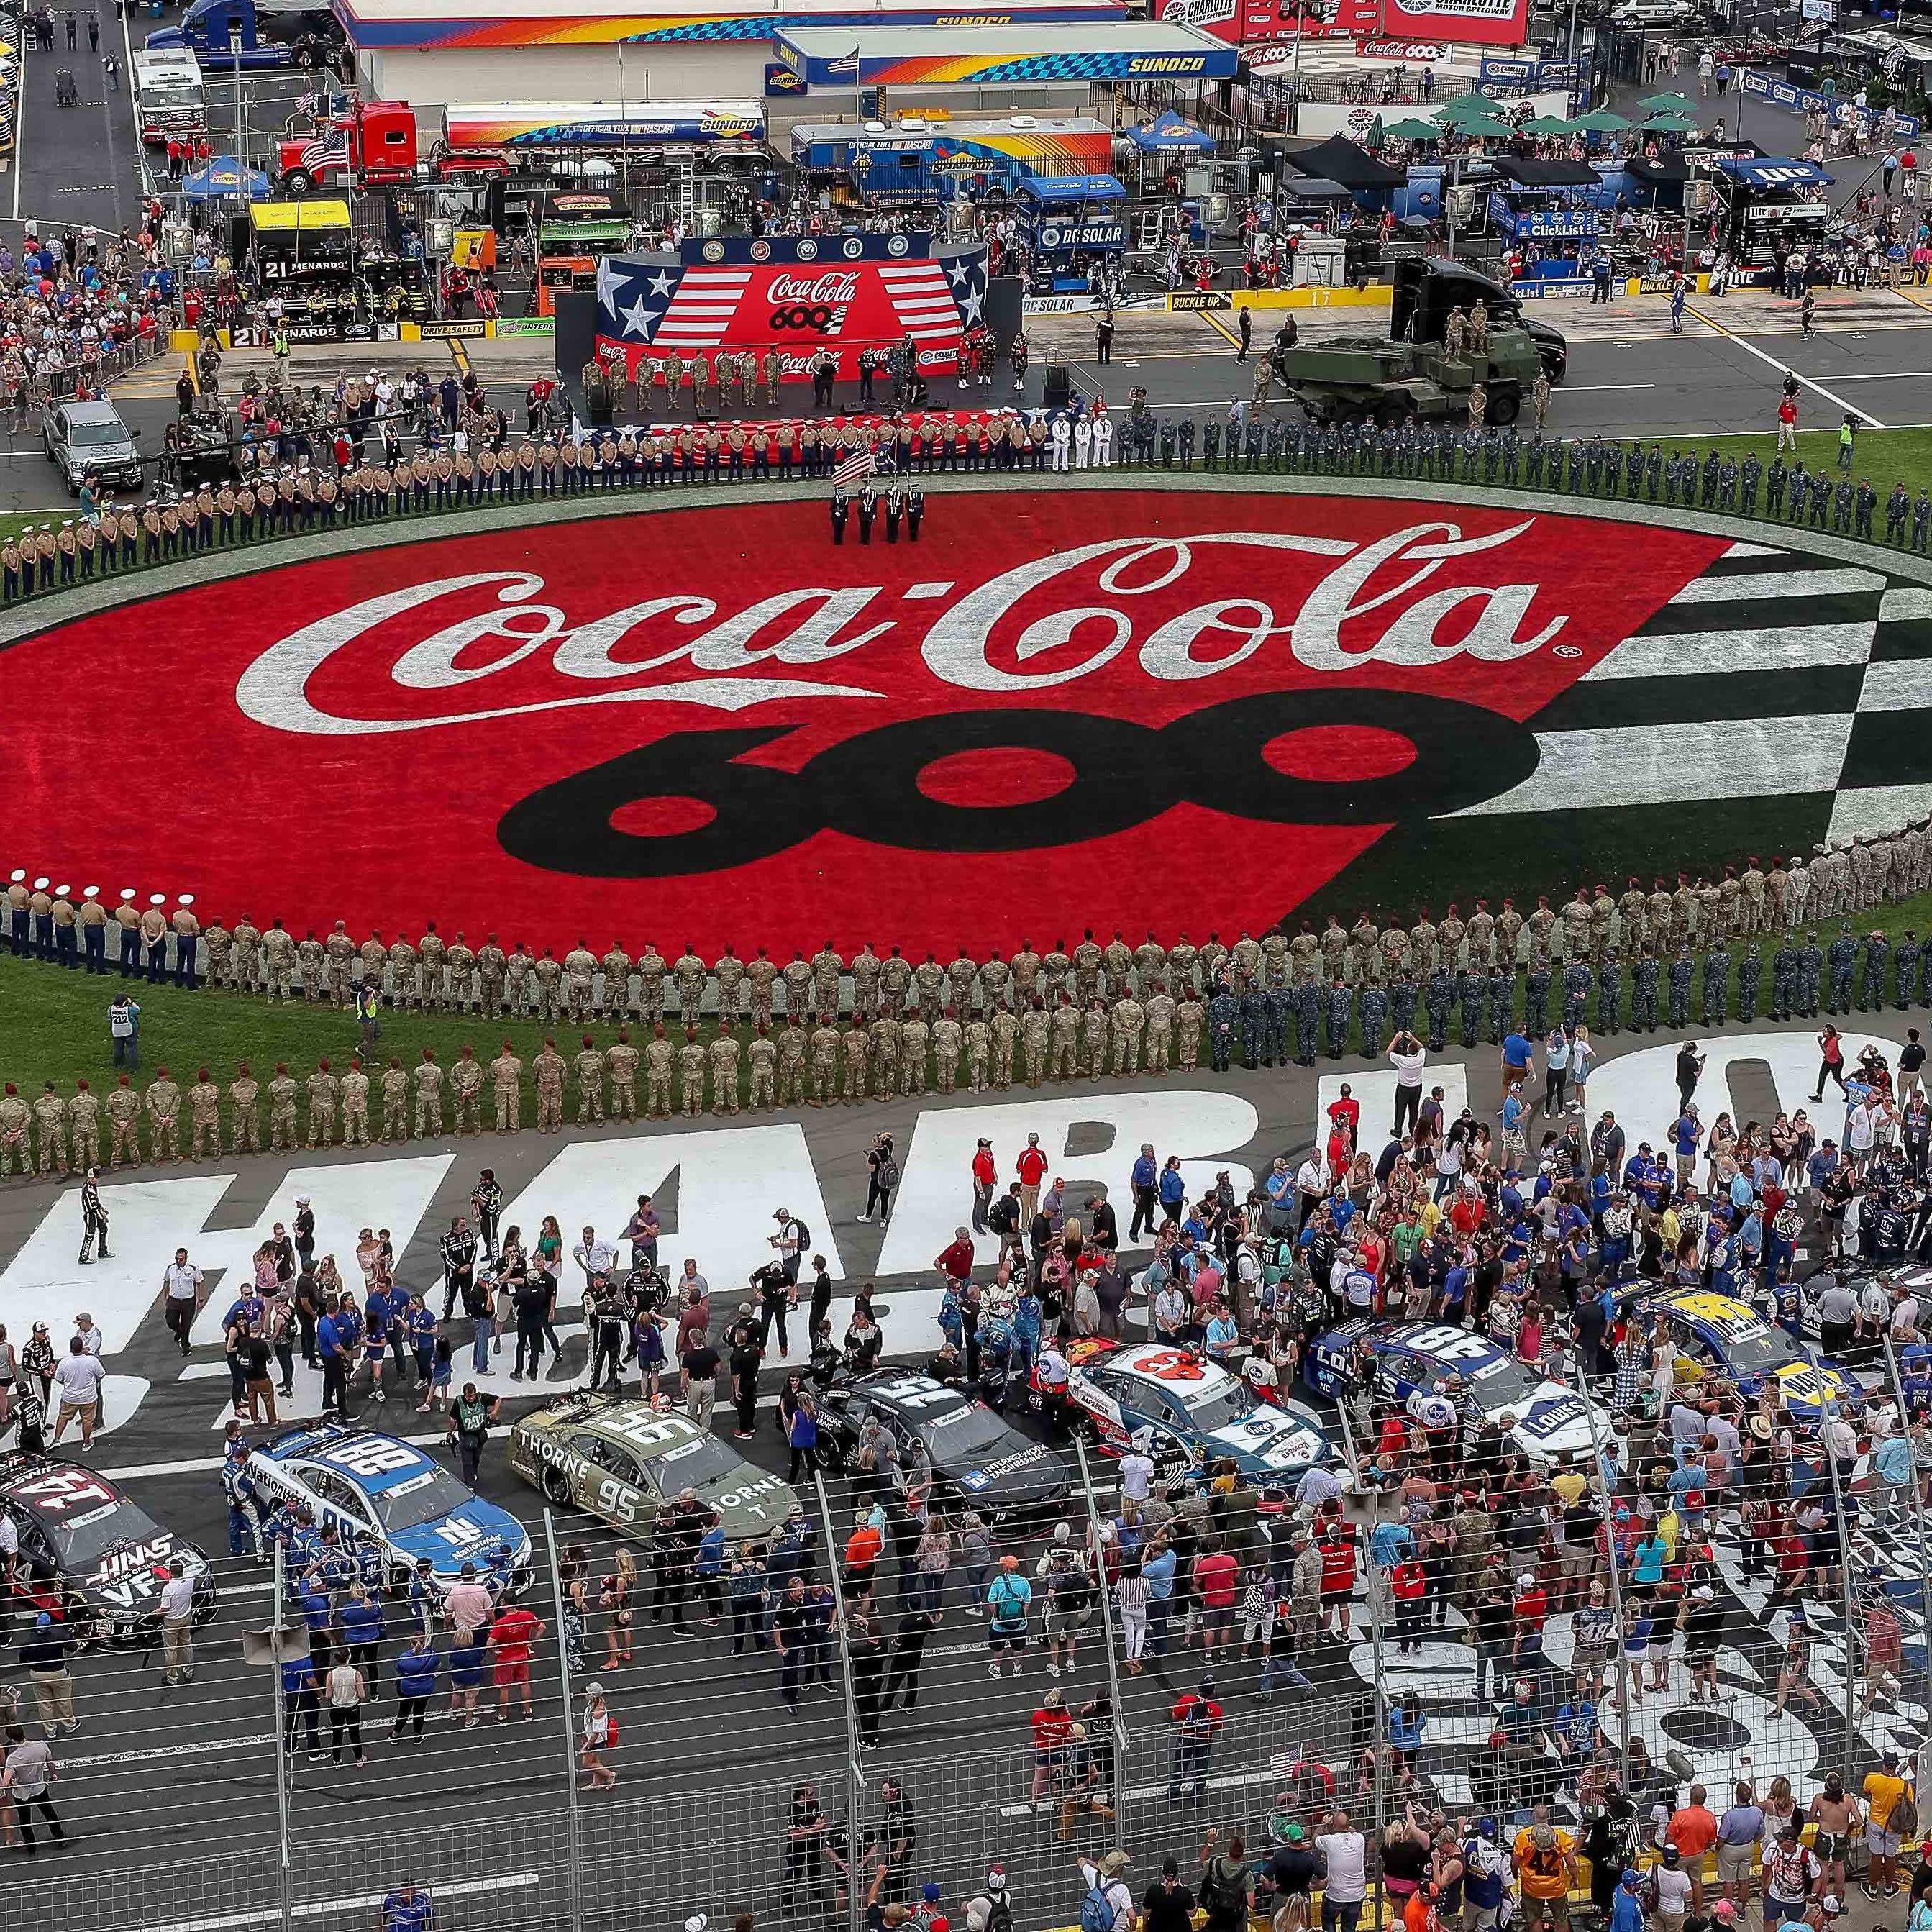 NASCAR: Coca-Cola 600 schedule, TV channel, start time